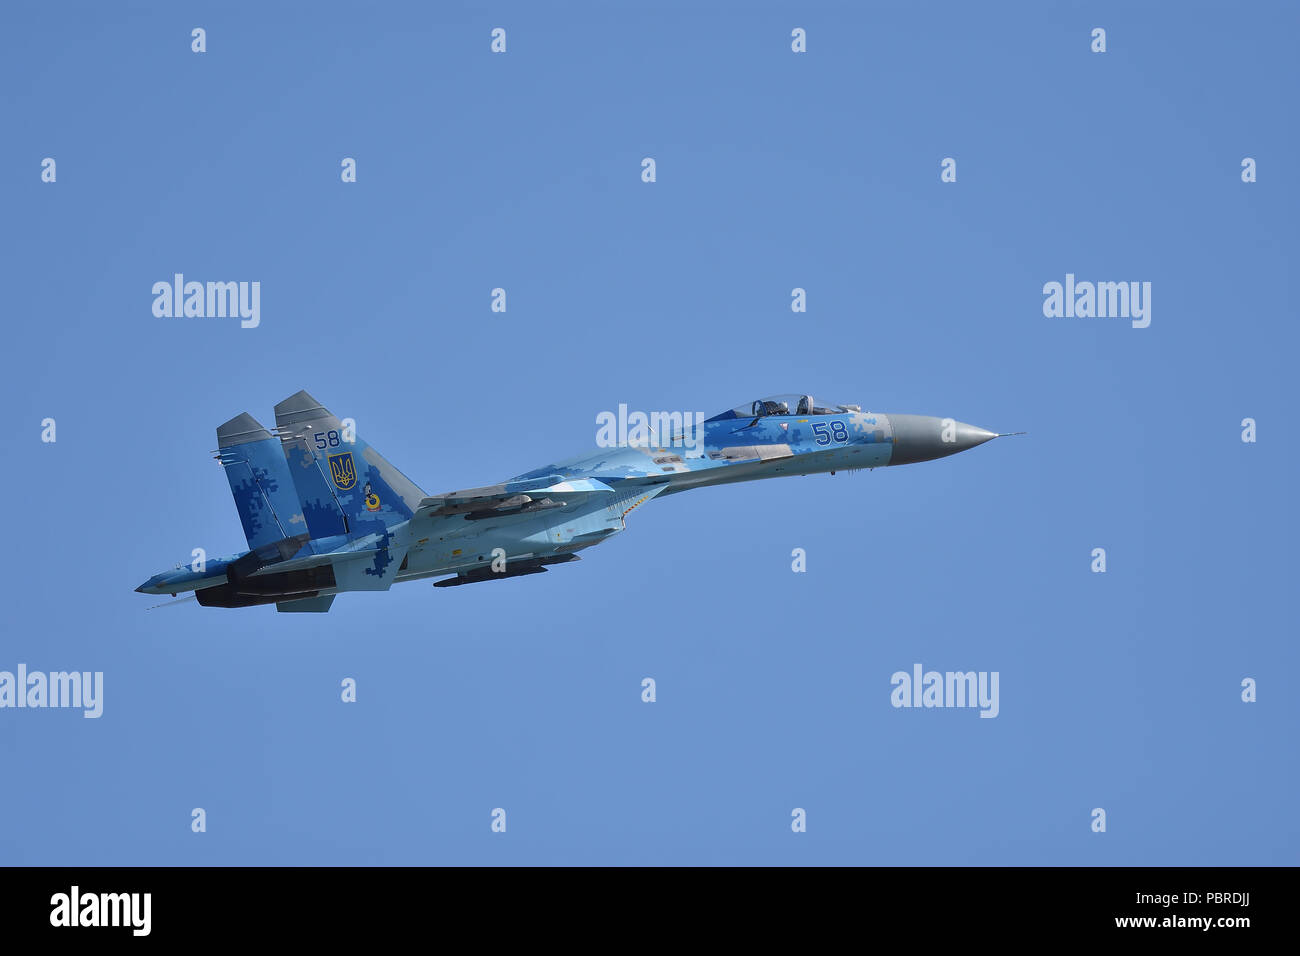 Ukrainian Sukhoi SU-27 Flanker RIAT Fairford 2018 - Stock Image